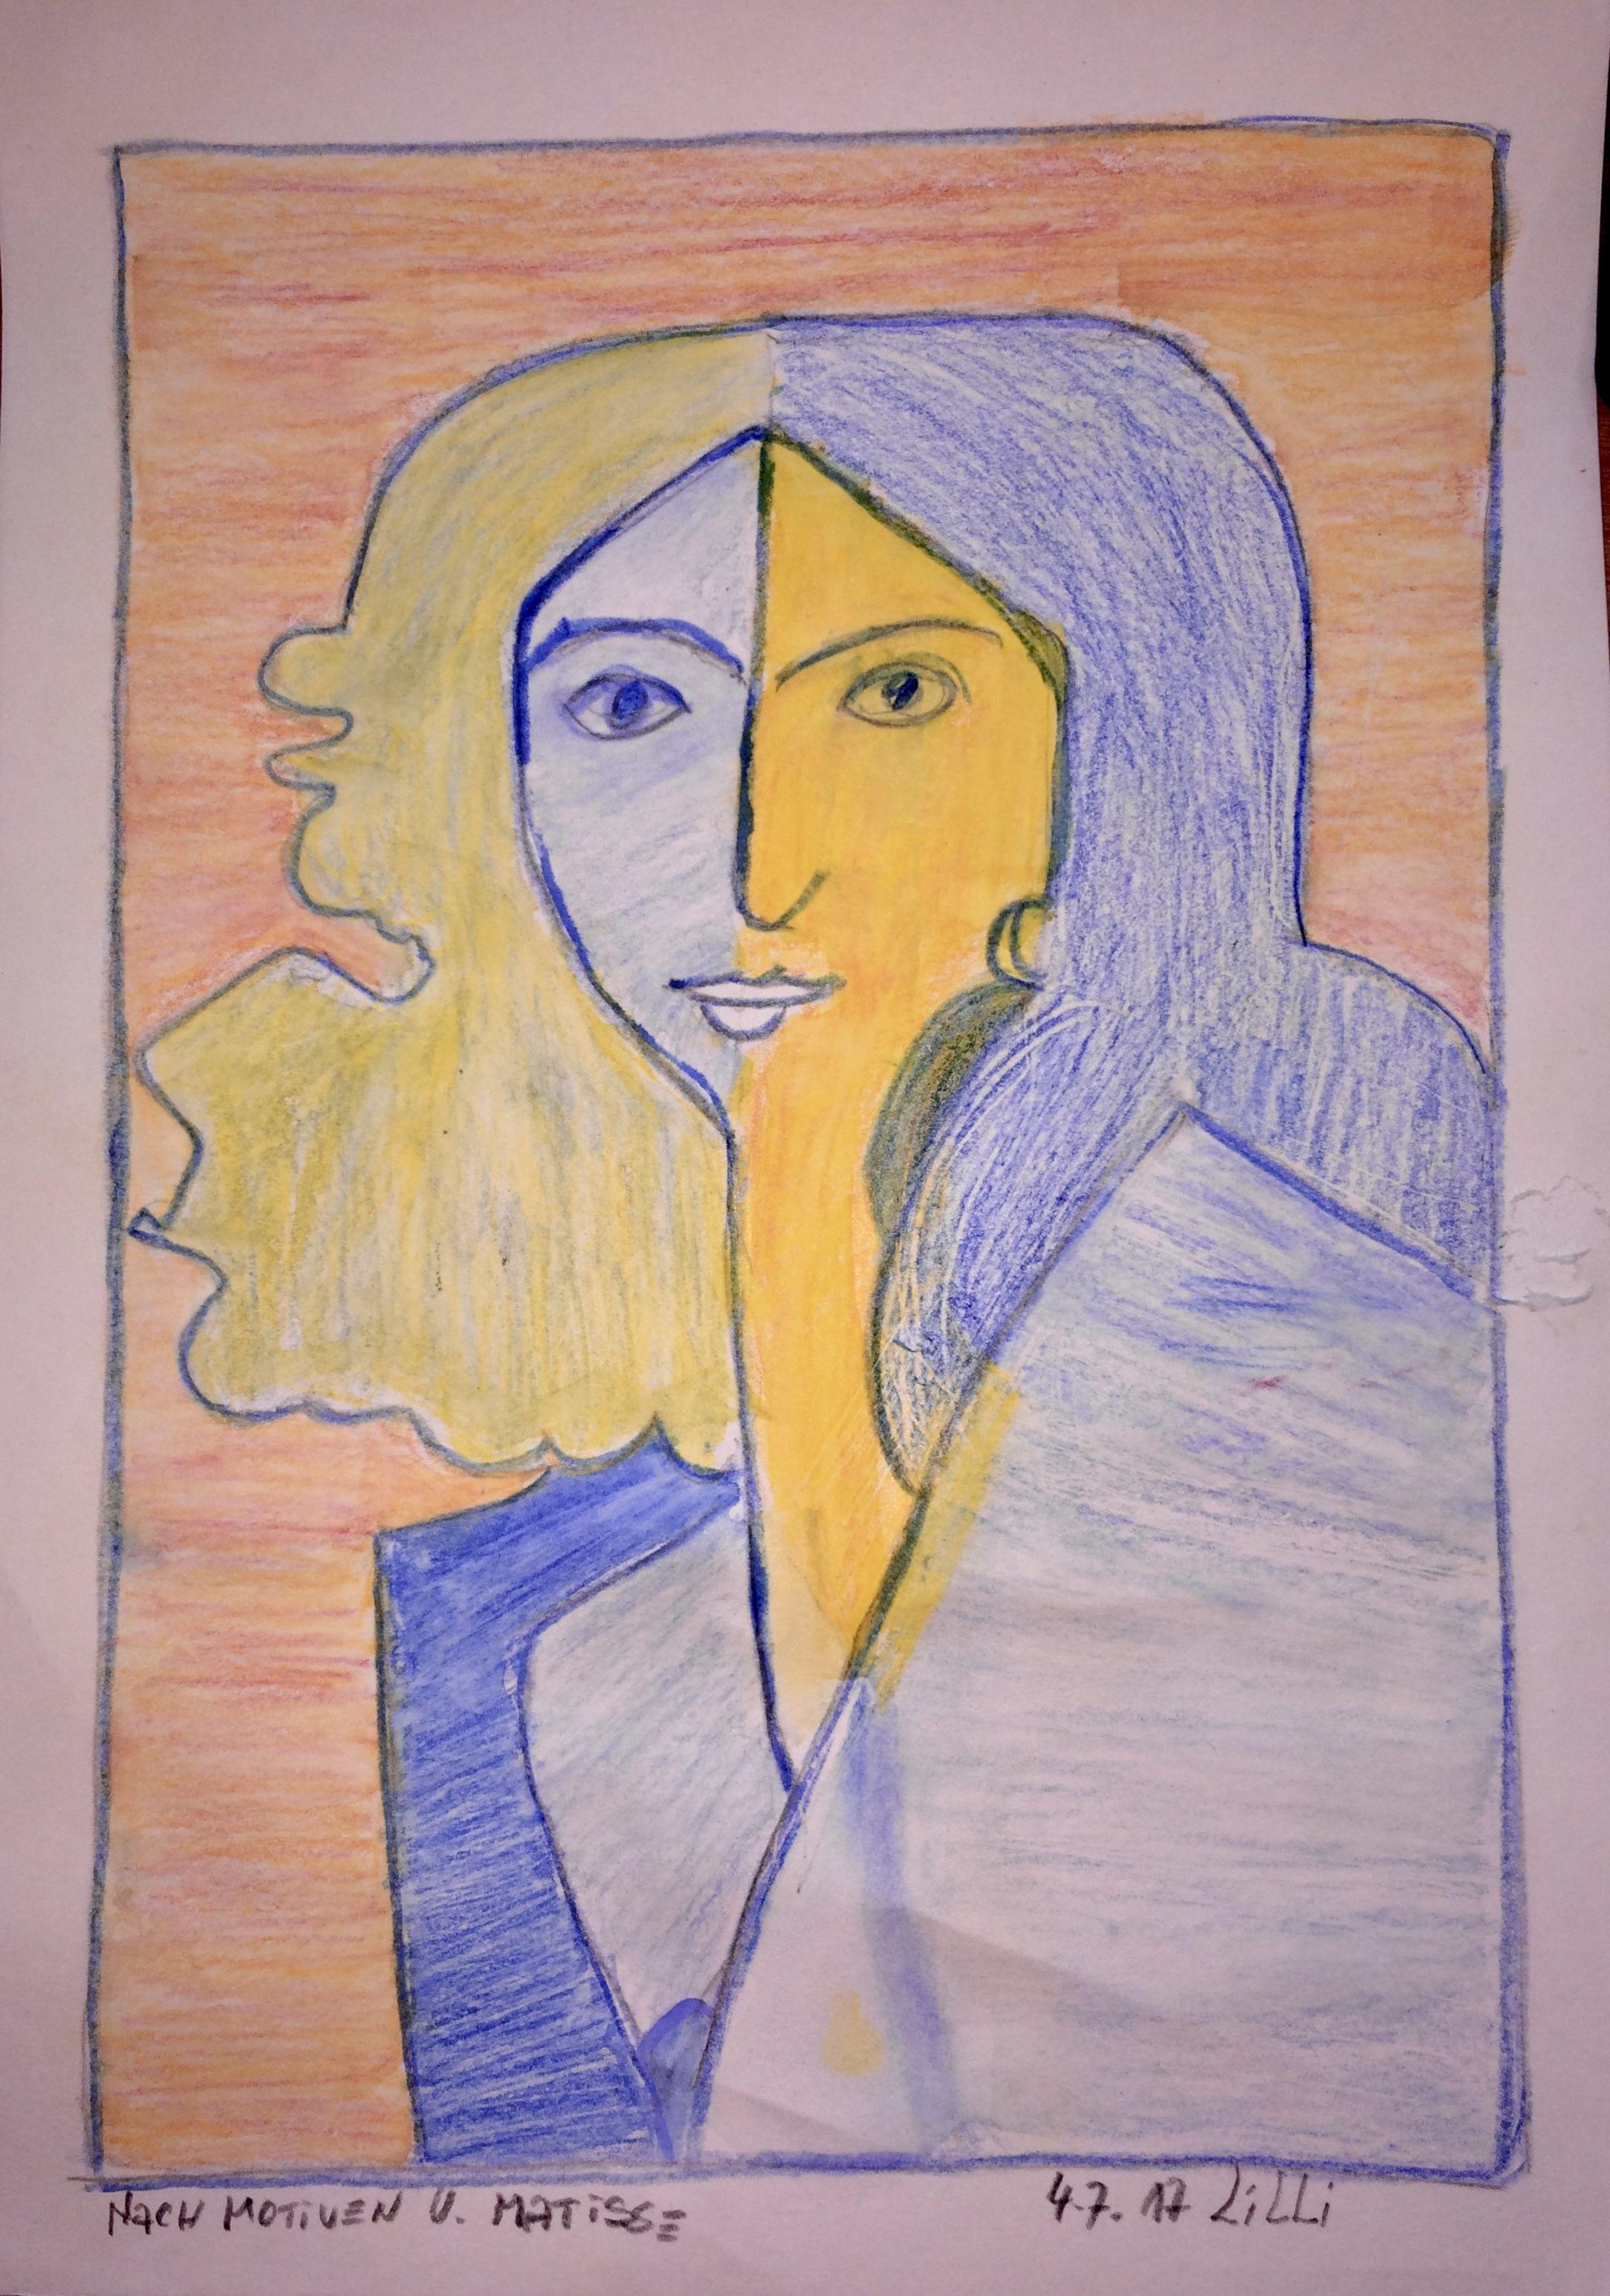 Lilli Frau Aquarellstifte n Motiven von Henri Matisse